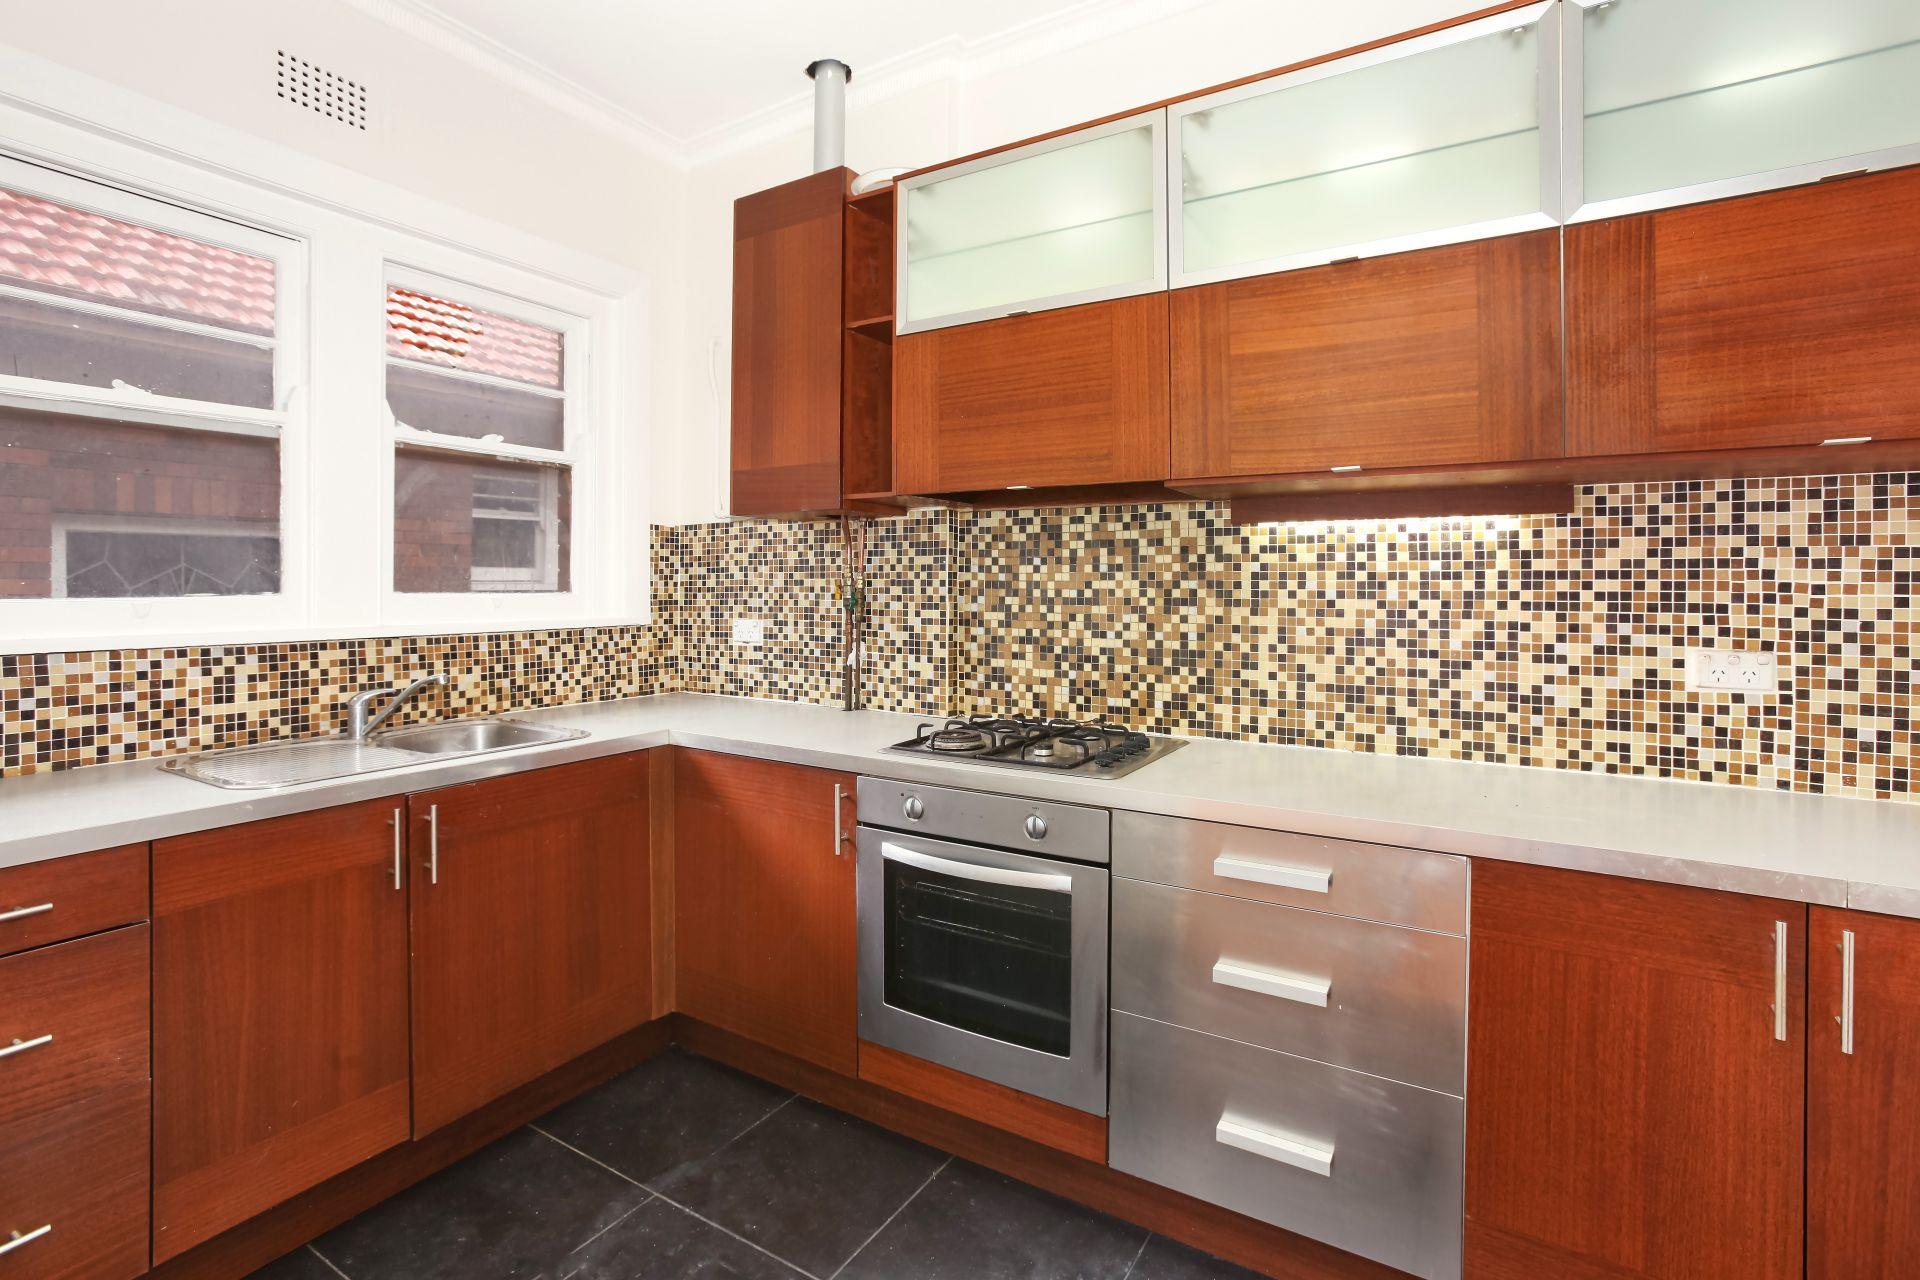 7/119 Parramatta Road, Haberfield NSW